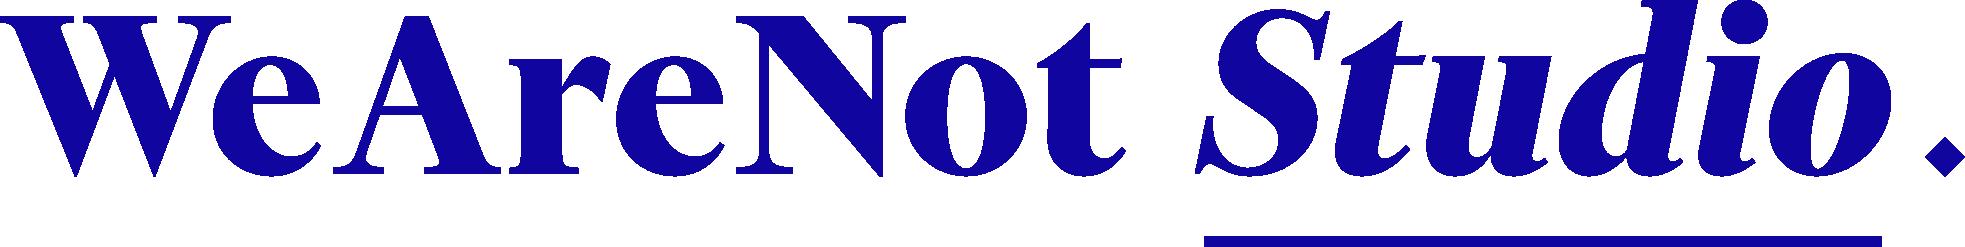 wearenot logo